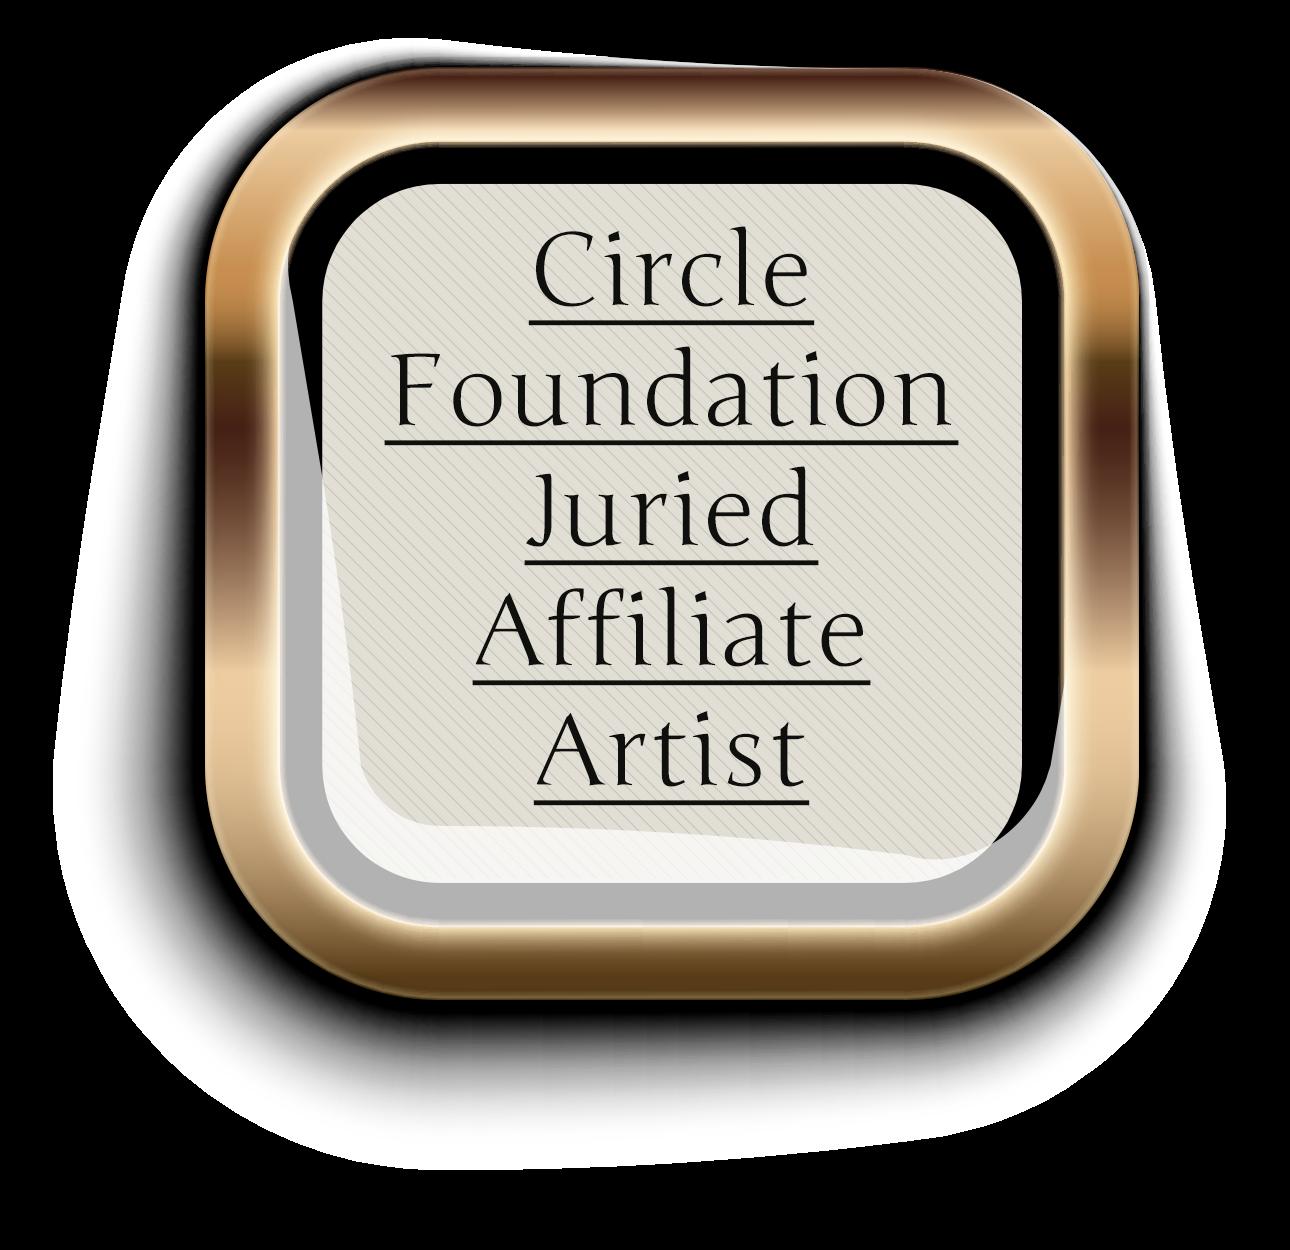 Affiliation fondation Circle